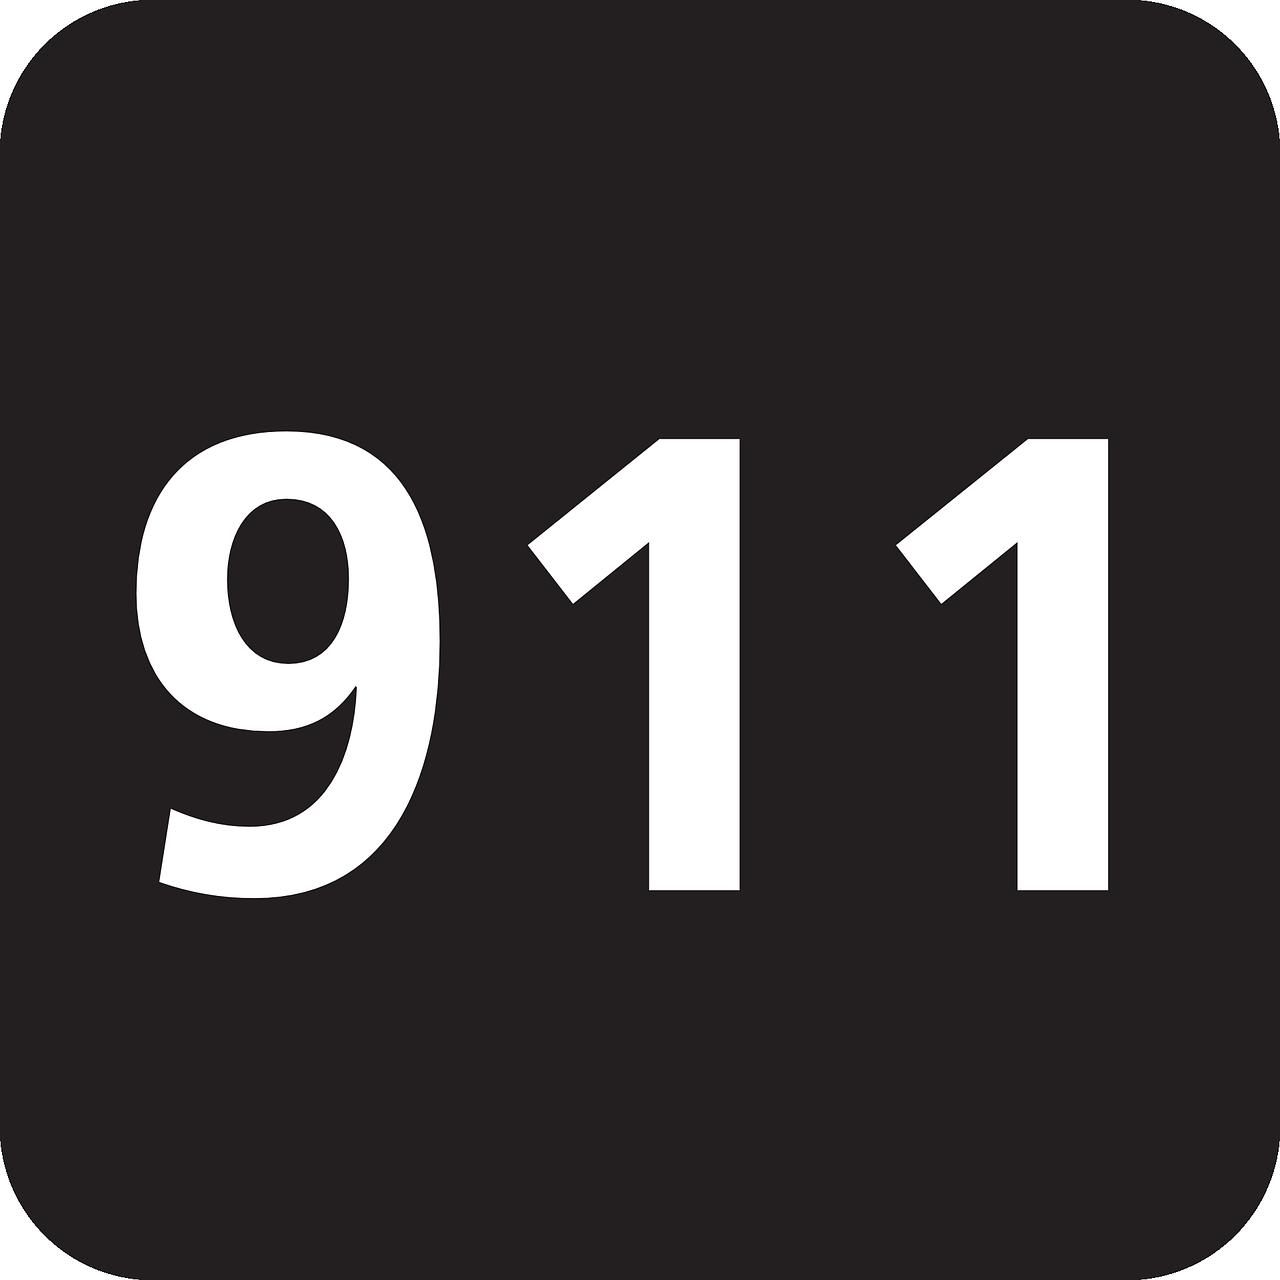 emergency-99144_1280.png